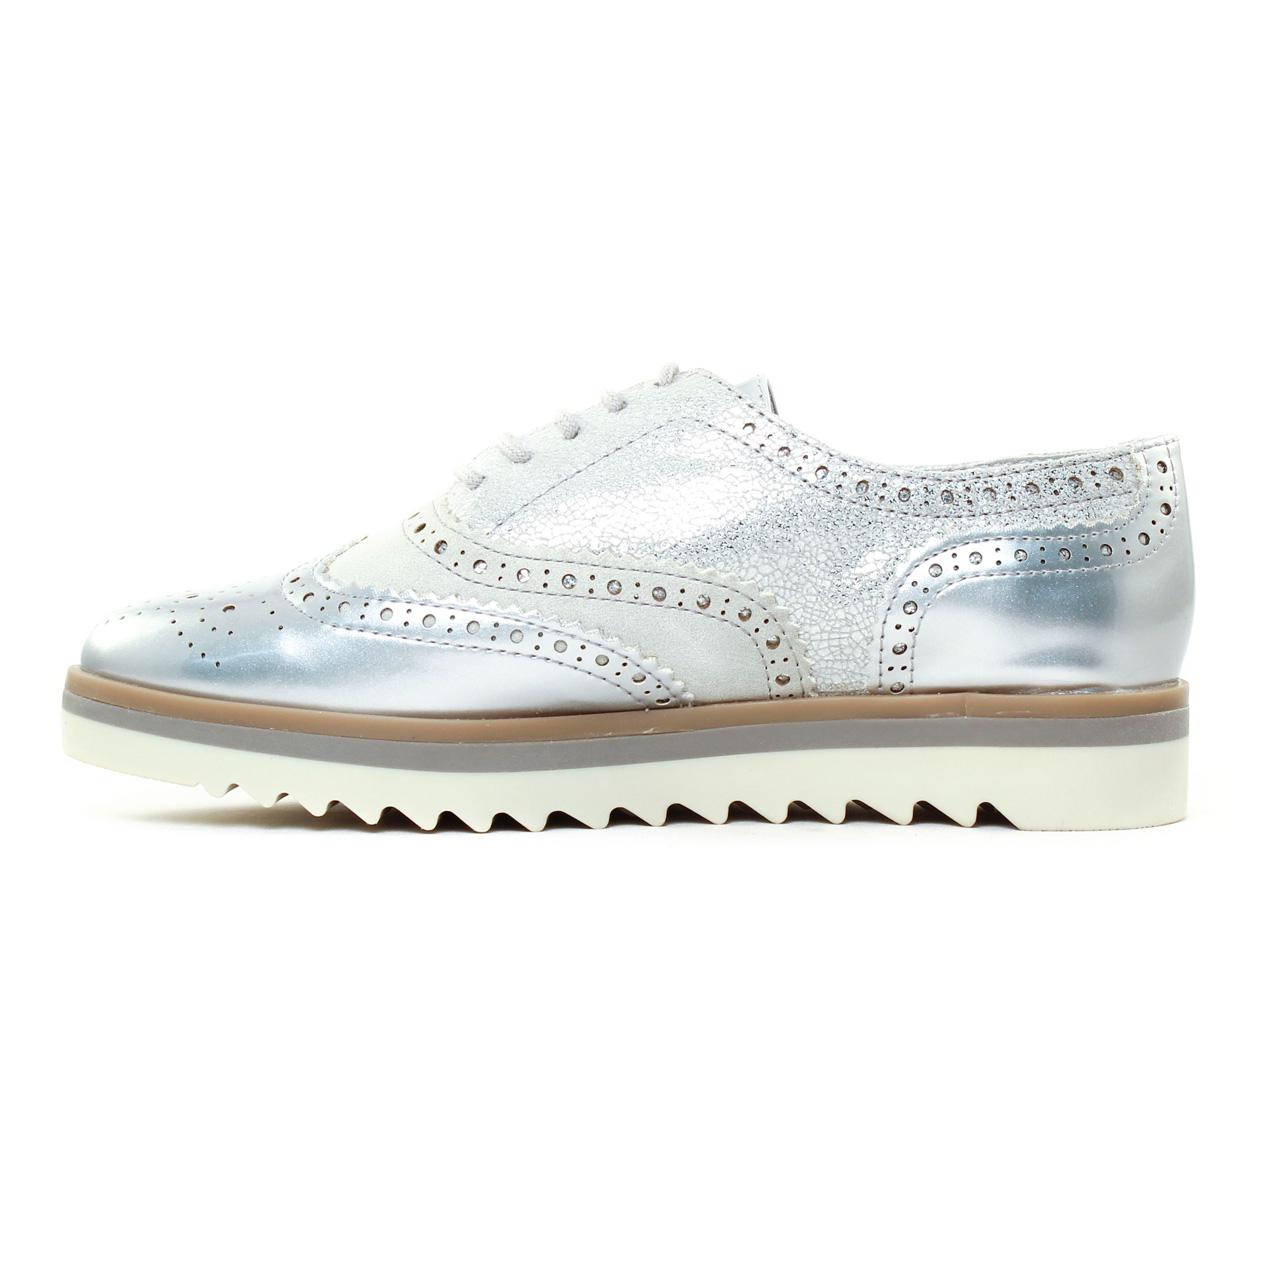 chaussures à lacets 23705 femme marco tozzi 23705 V1VPaAPp